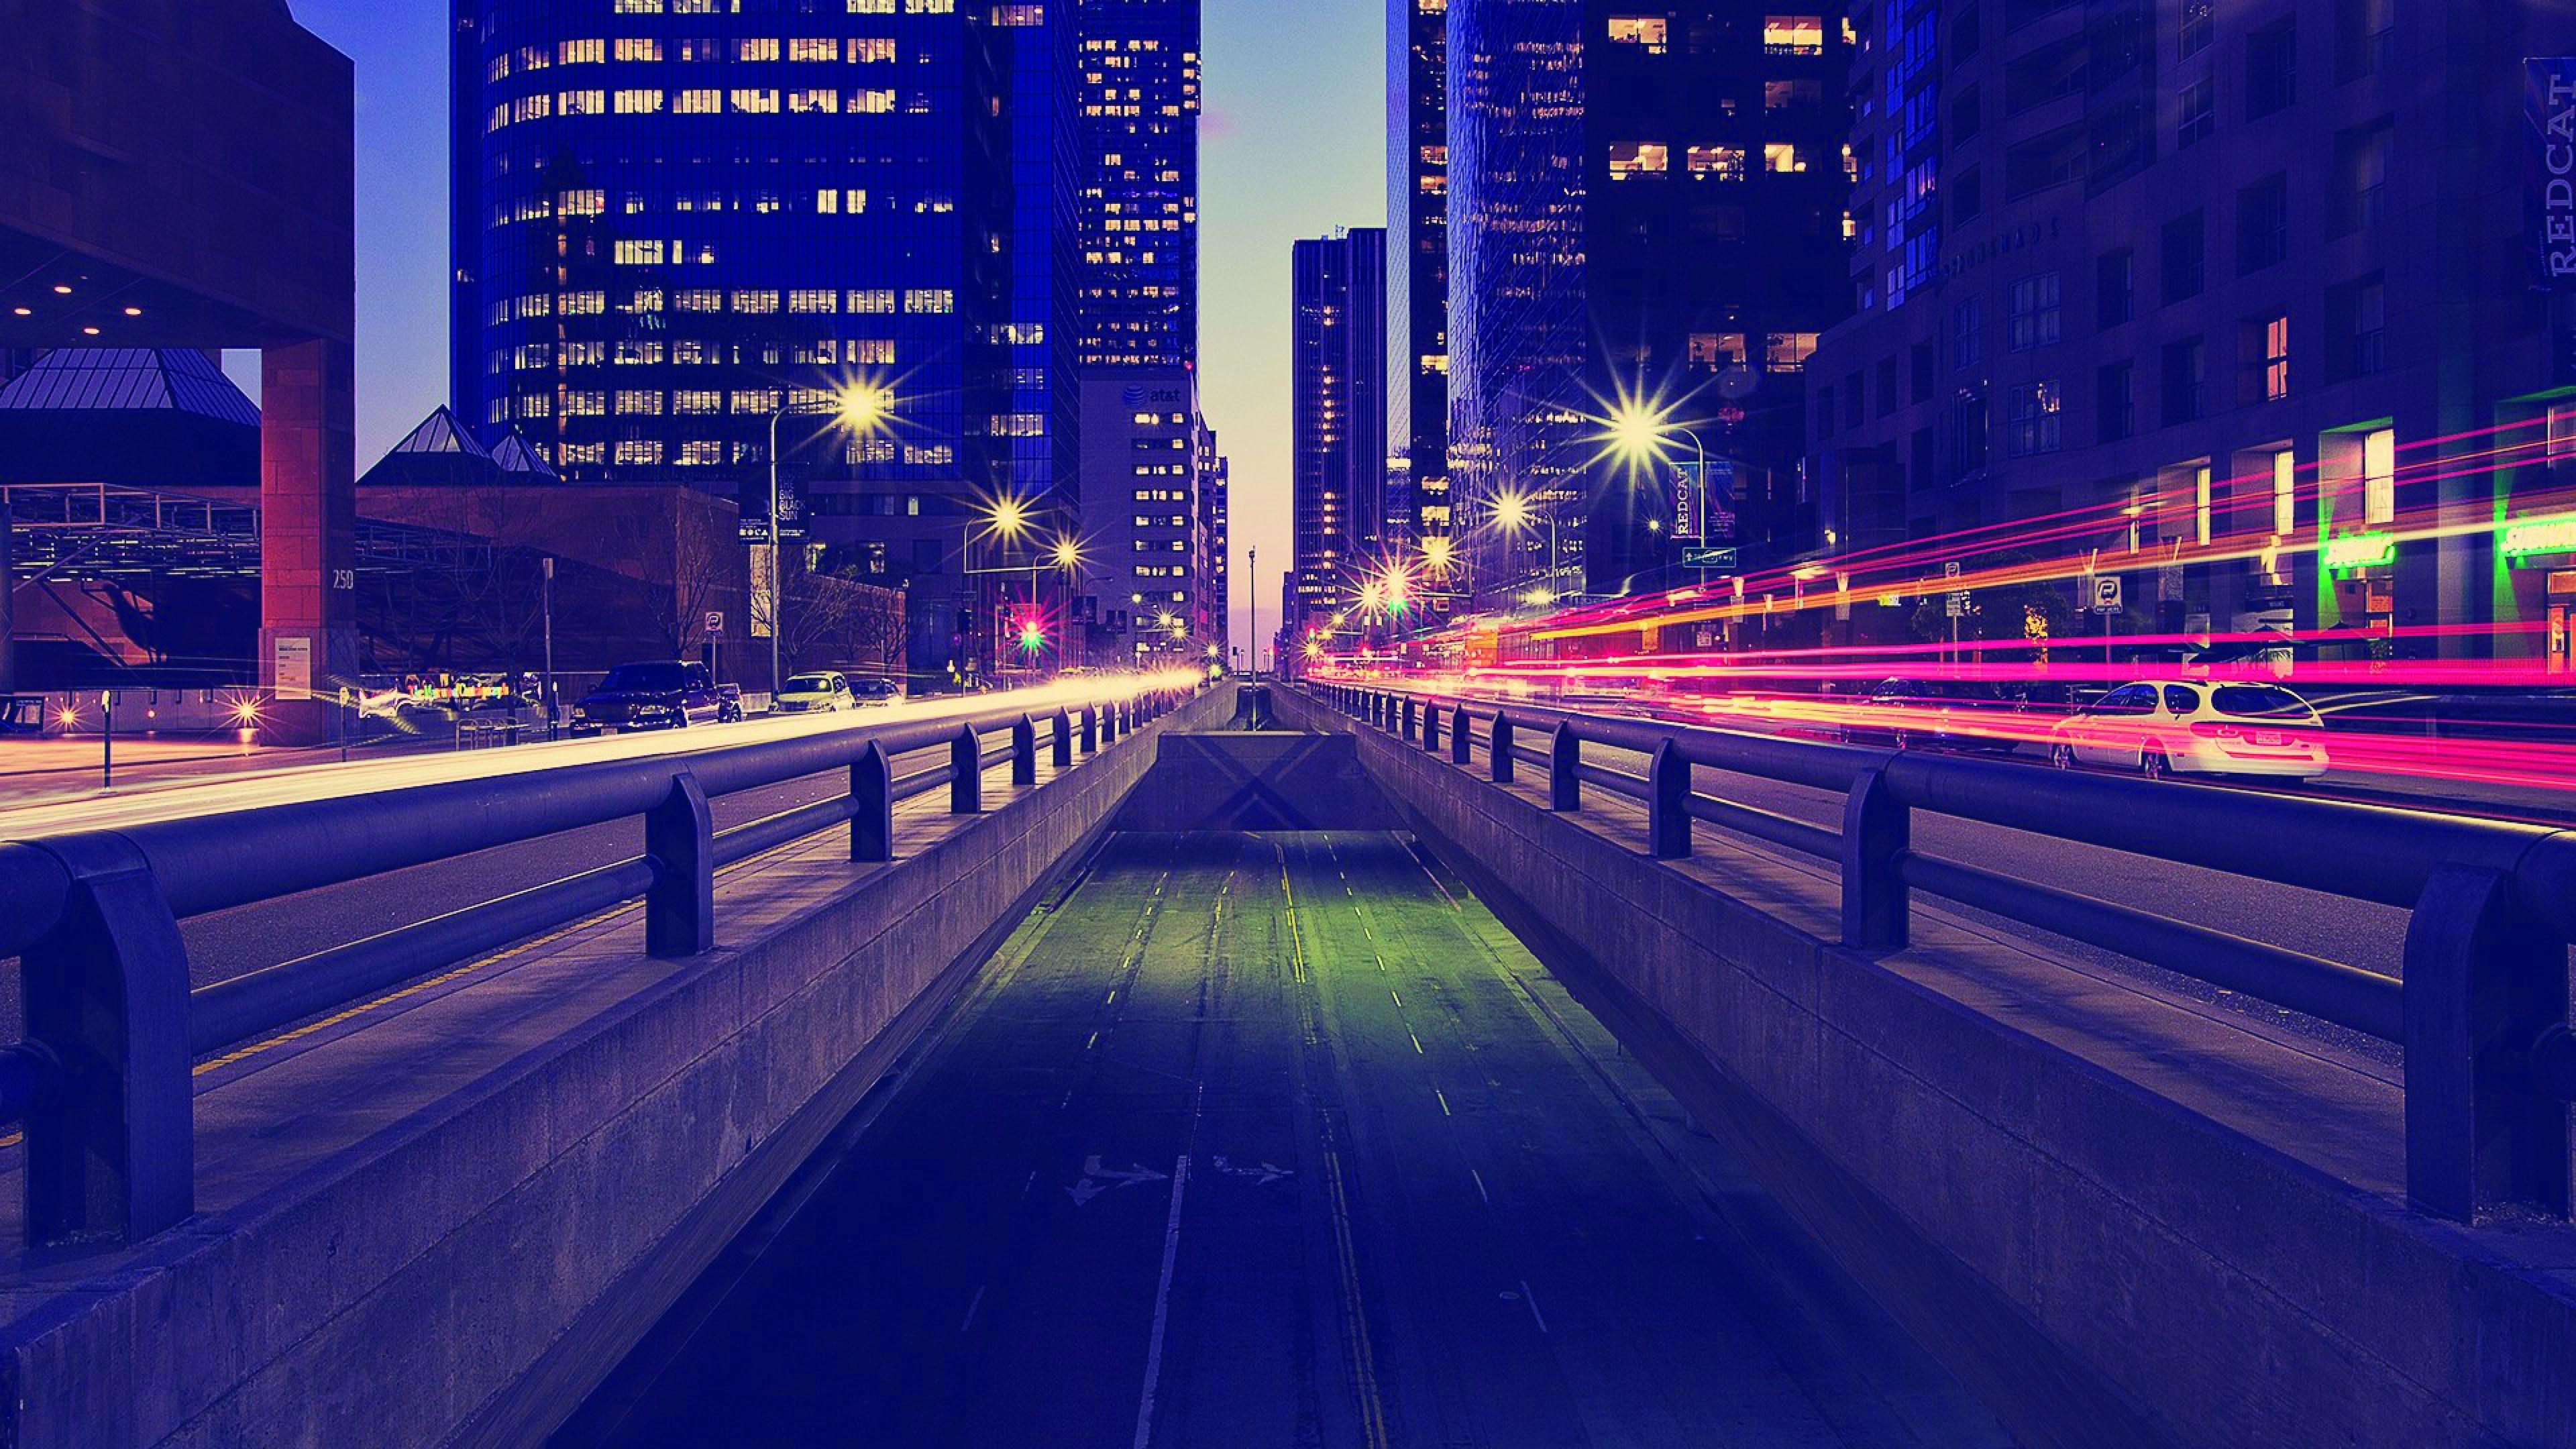 road_traffic_night_city_lights_48200_3840x2160